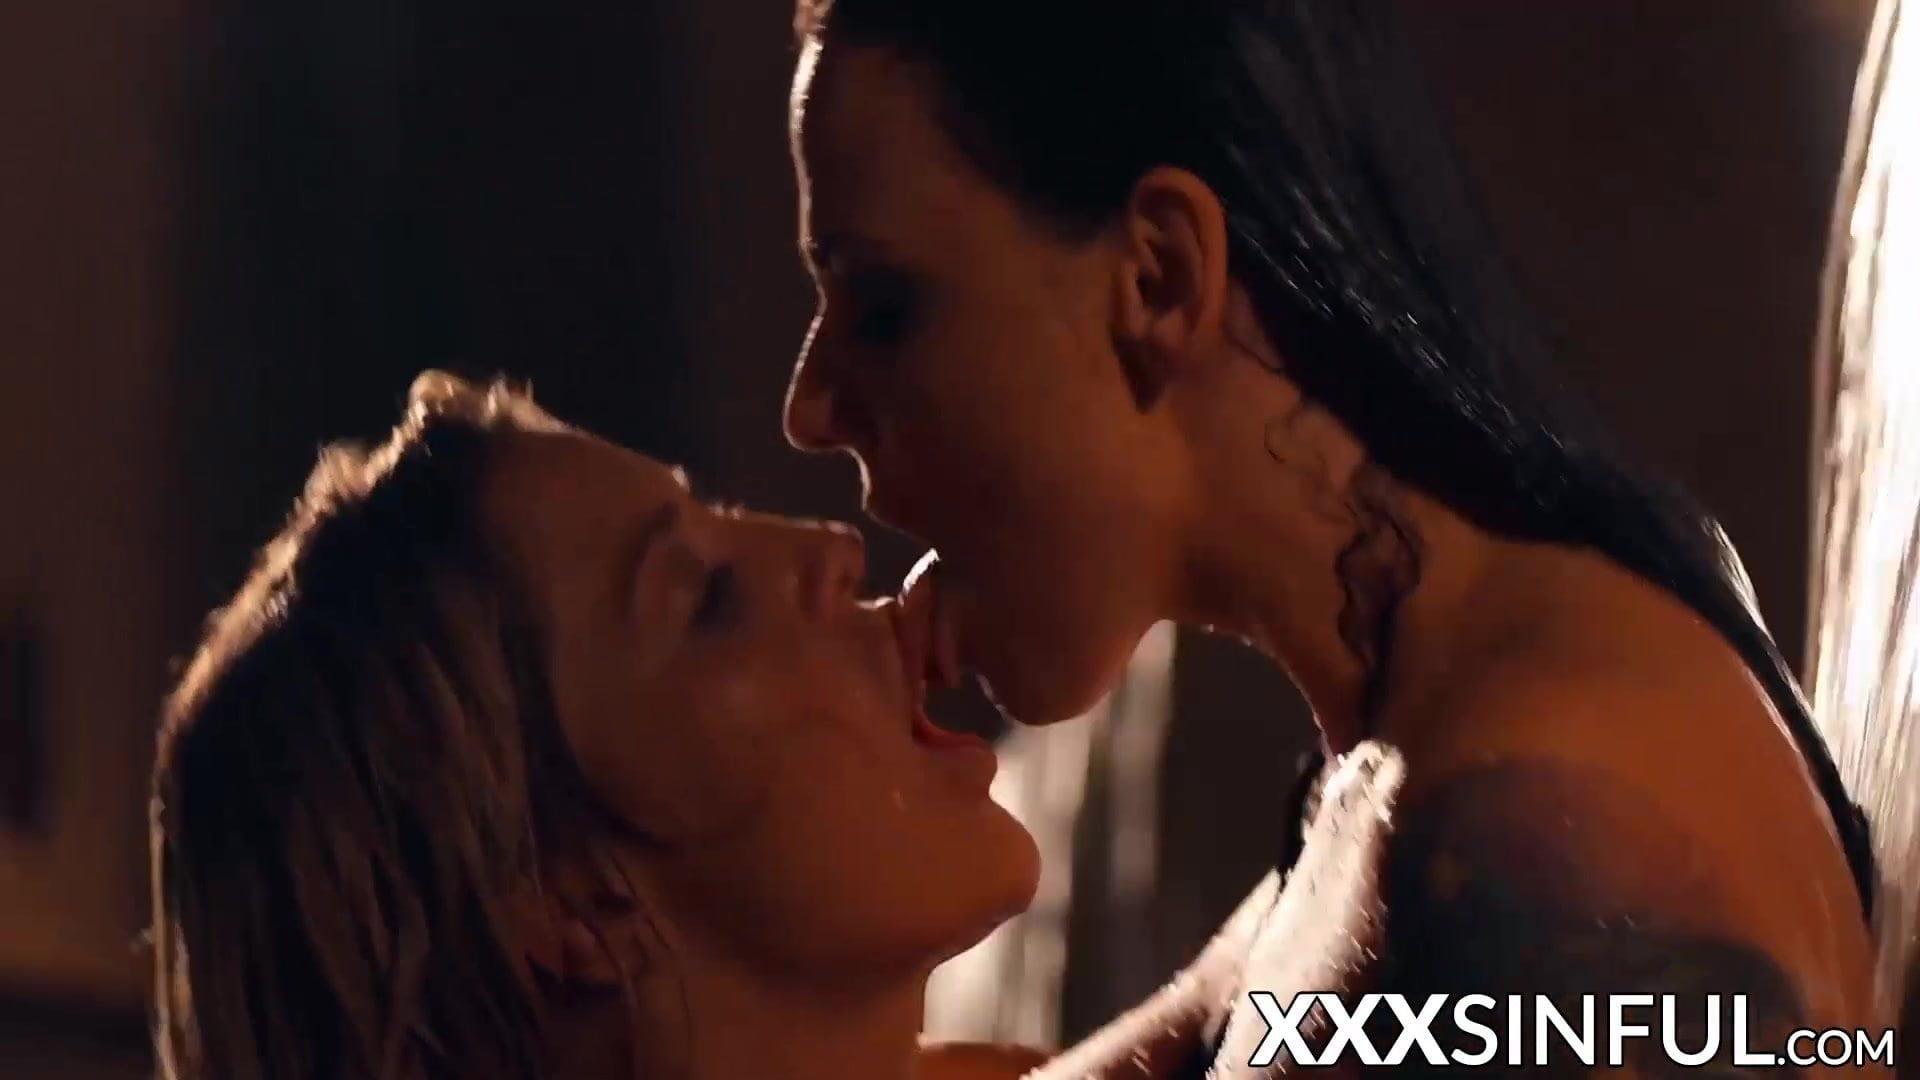 Luscious lesbian girlfriends scissoring in oral pool